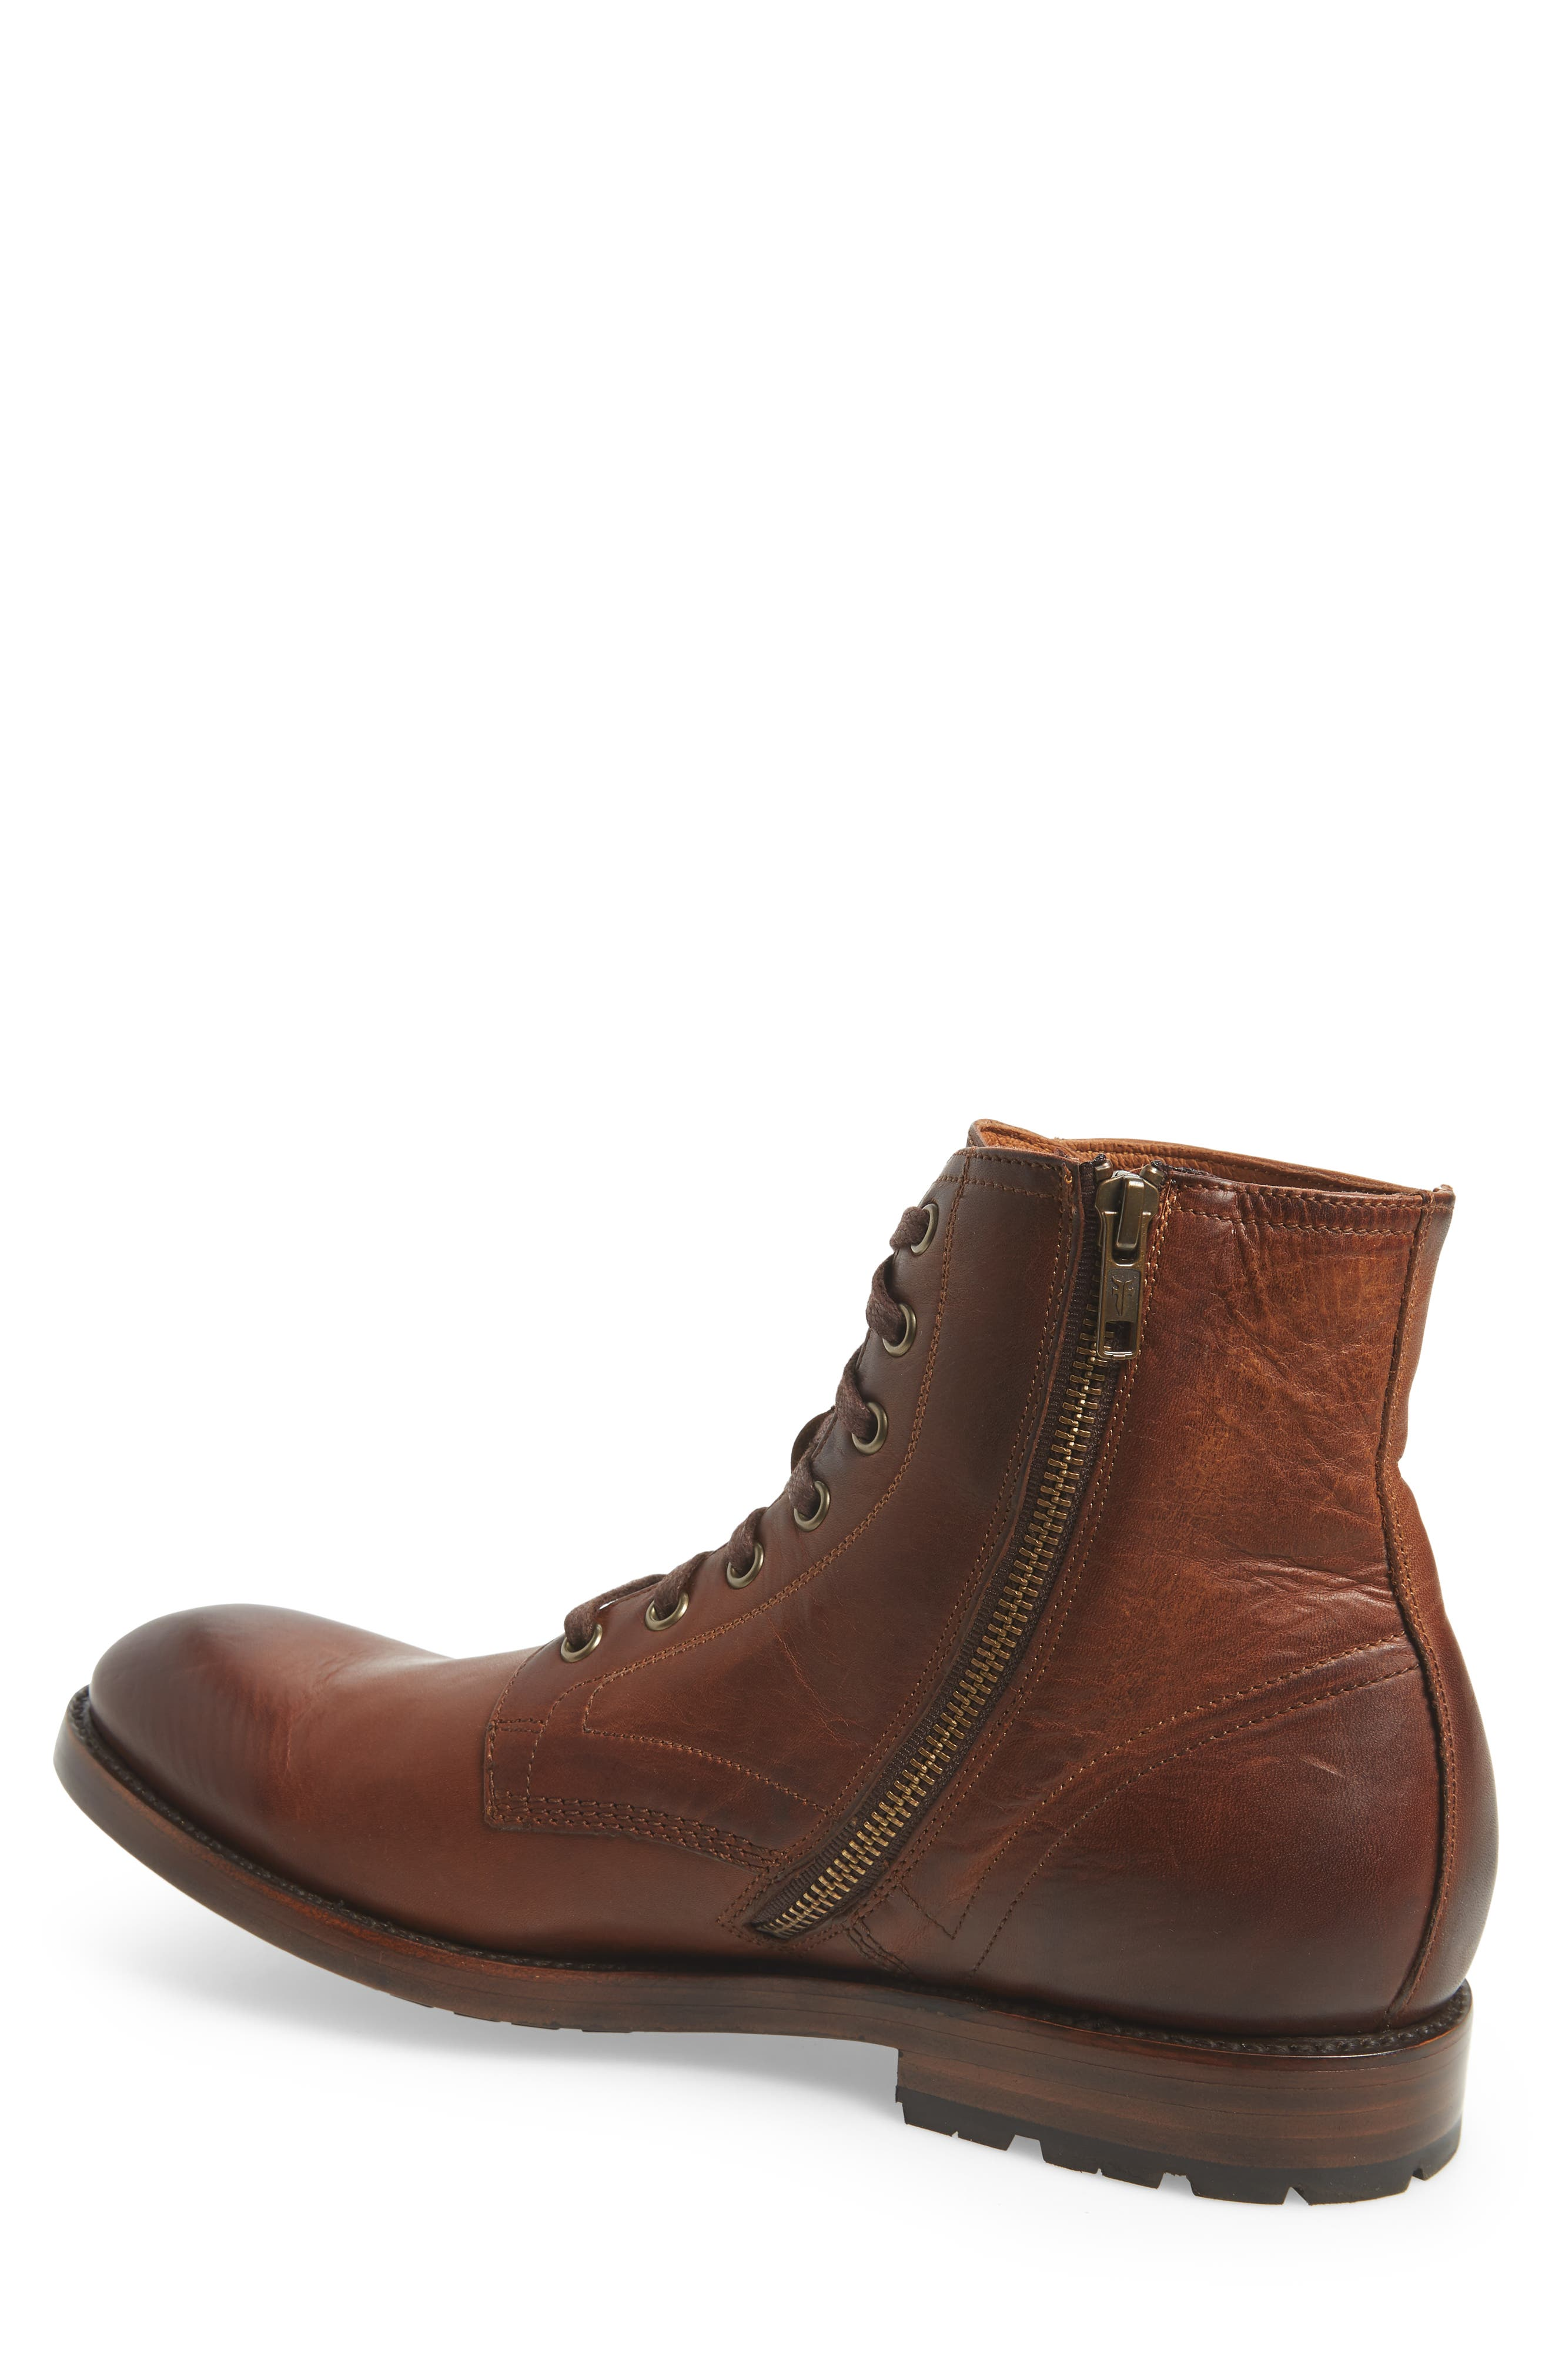 Bowery Plain Toe Boot,                             Alternate thumbnail 2, color,                             COGNAC